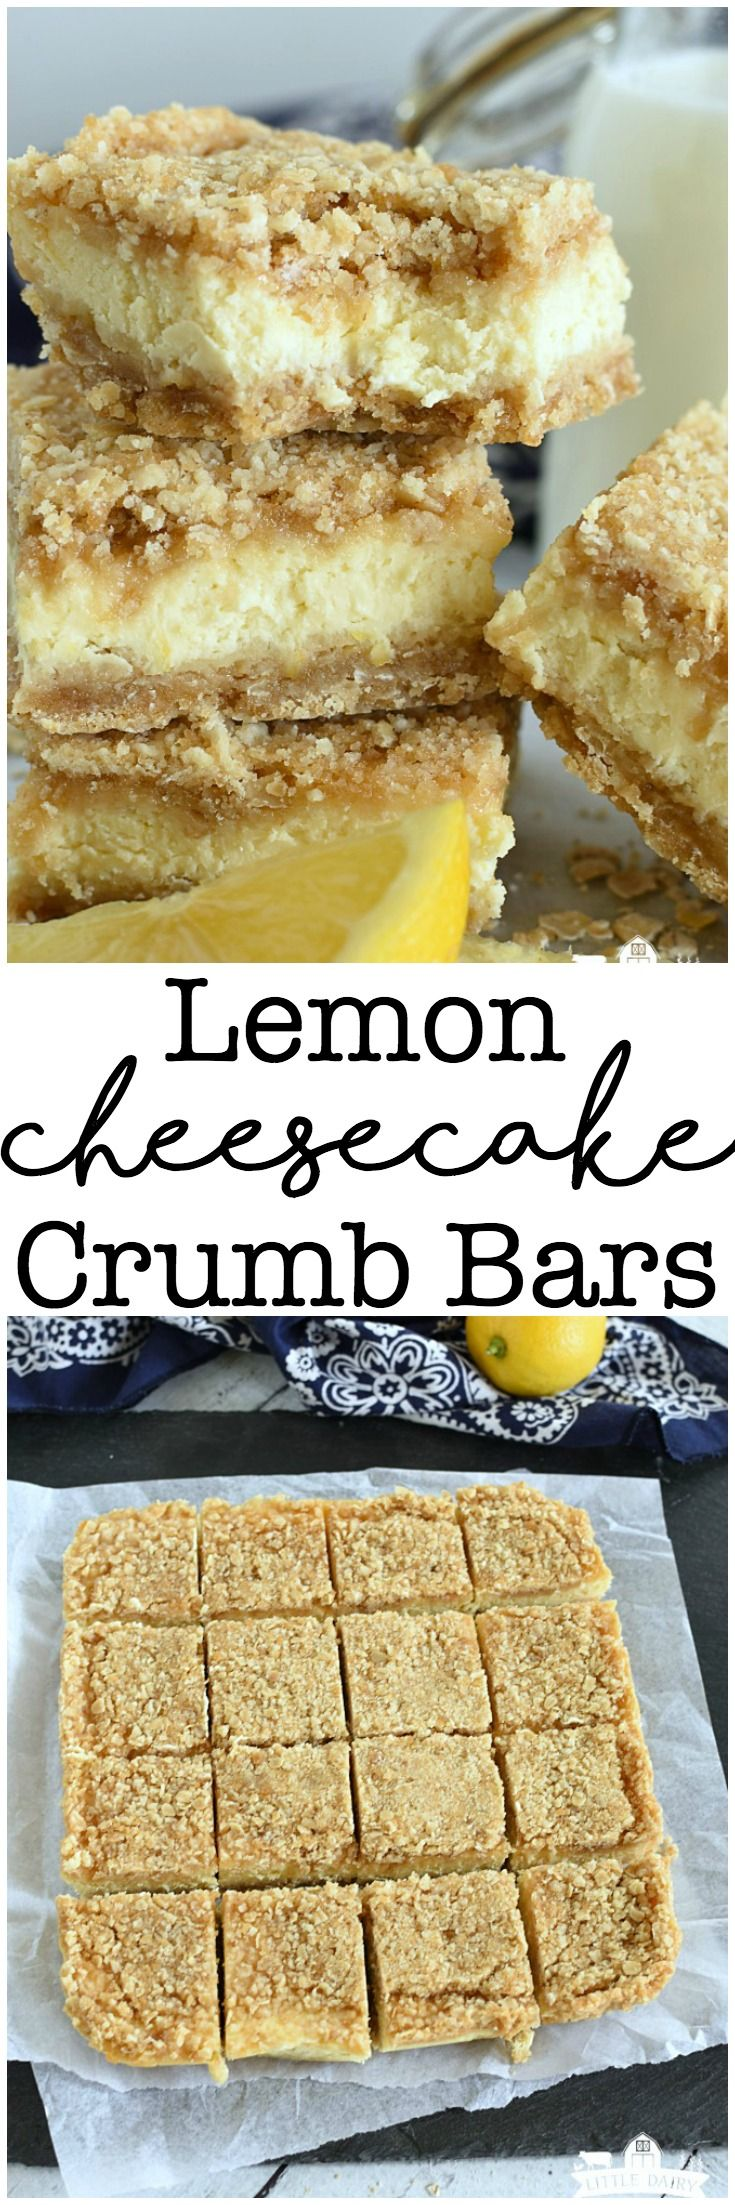 Lemon Cheesecake Crumb Bars - yummy lemon cheesecake layer between buttery oatmeal crumb layers! Easy dessert! Bar cookies! #ad #dairywest #UndeniablyDairy